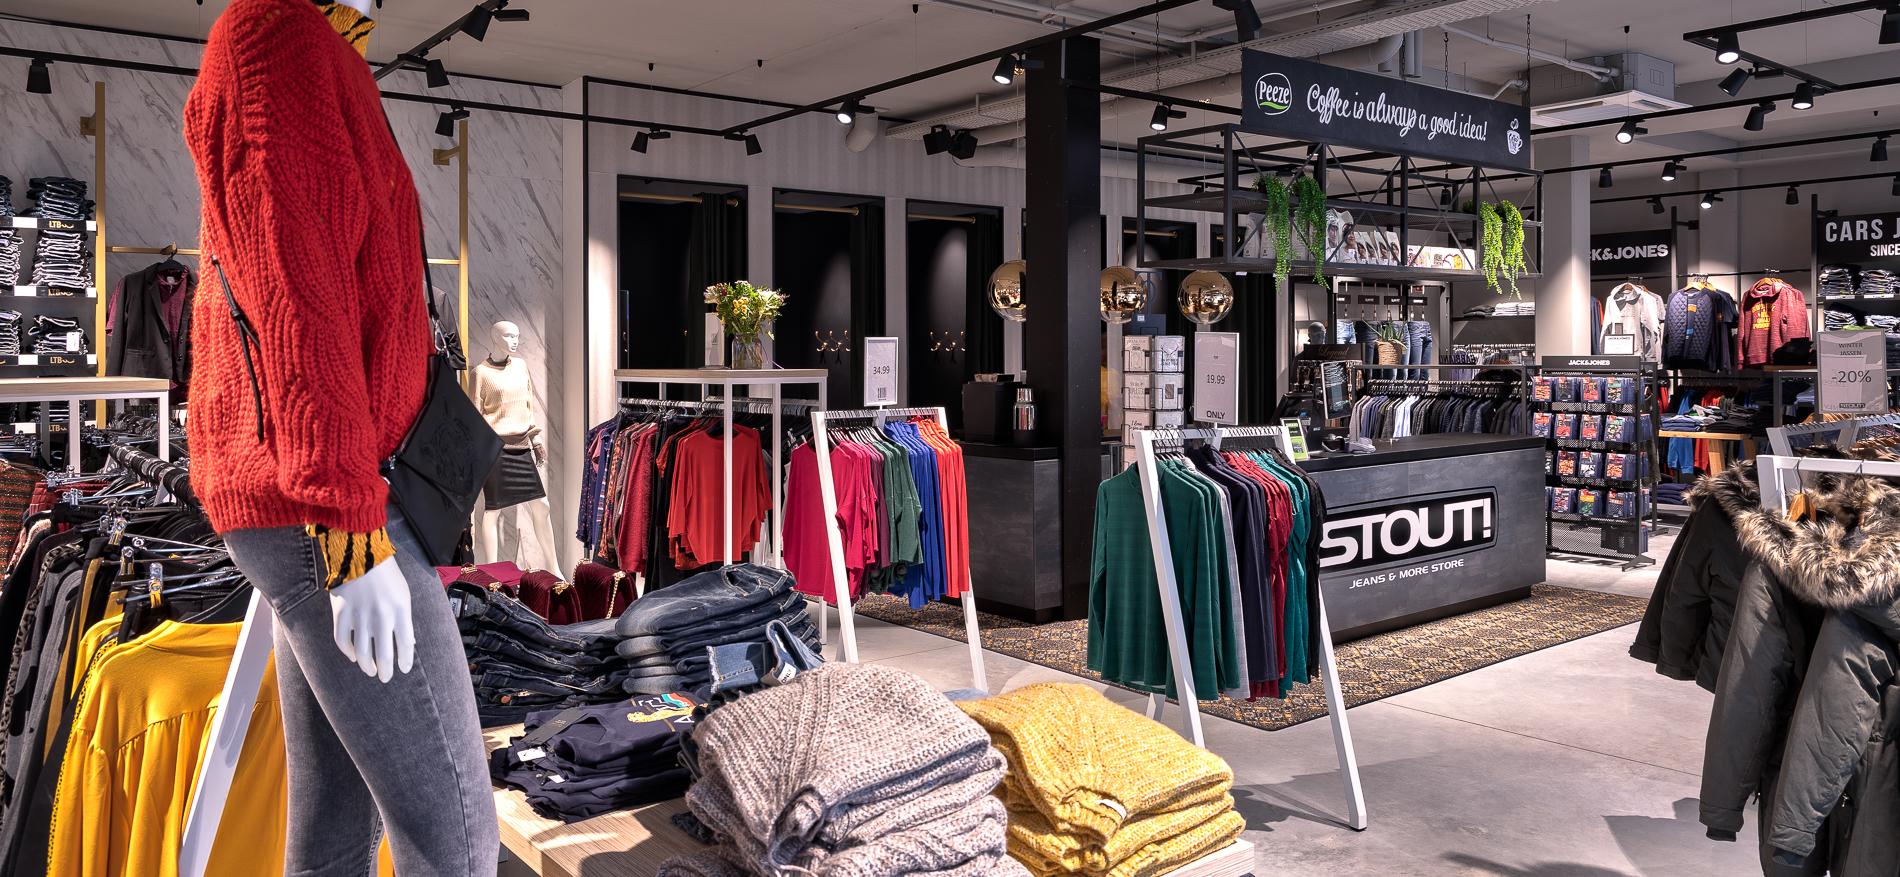 WSB: Retail branding & retail design | Budgettering en Winkelinrichting van Stout! Jeans & More